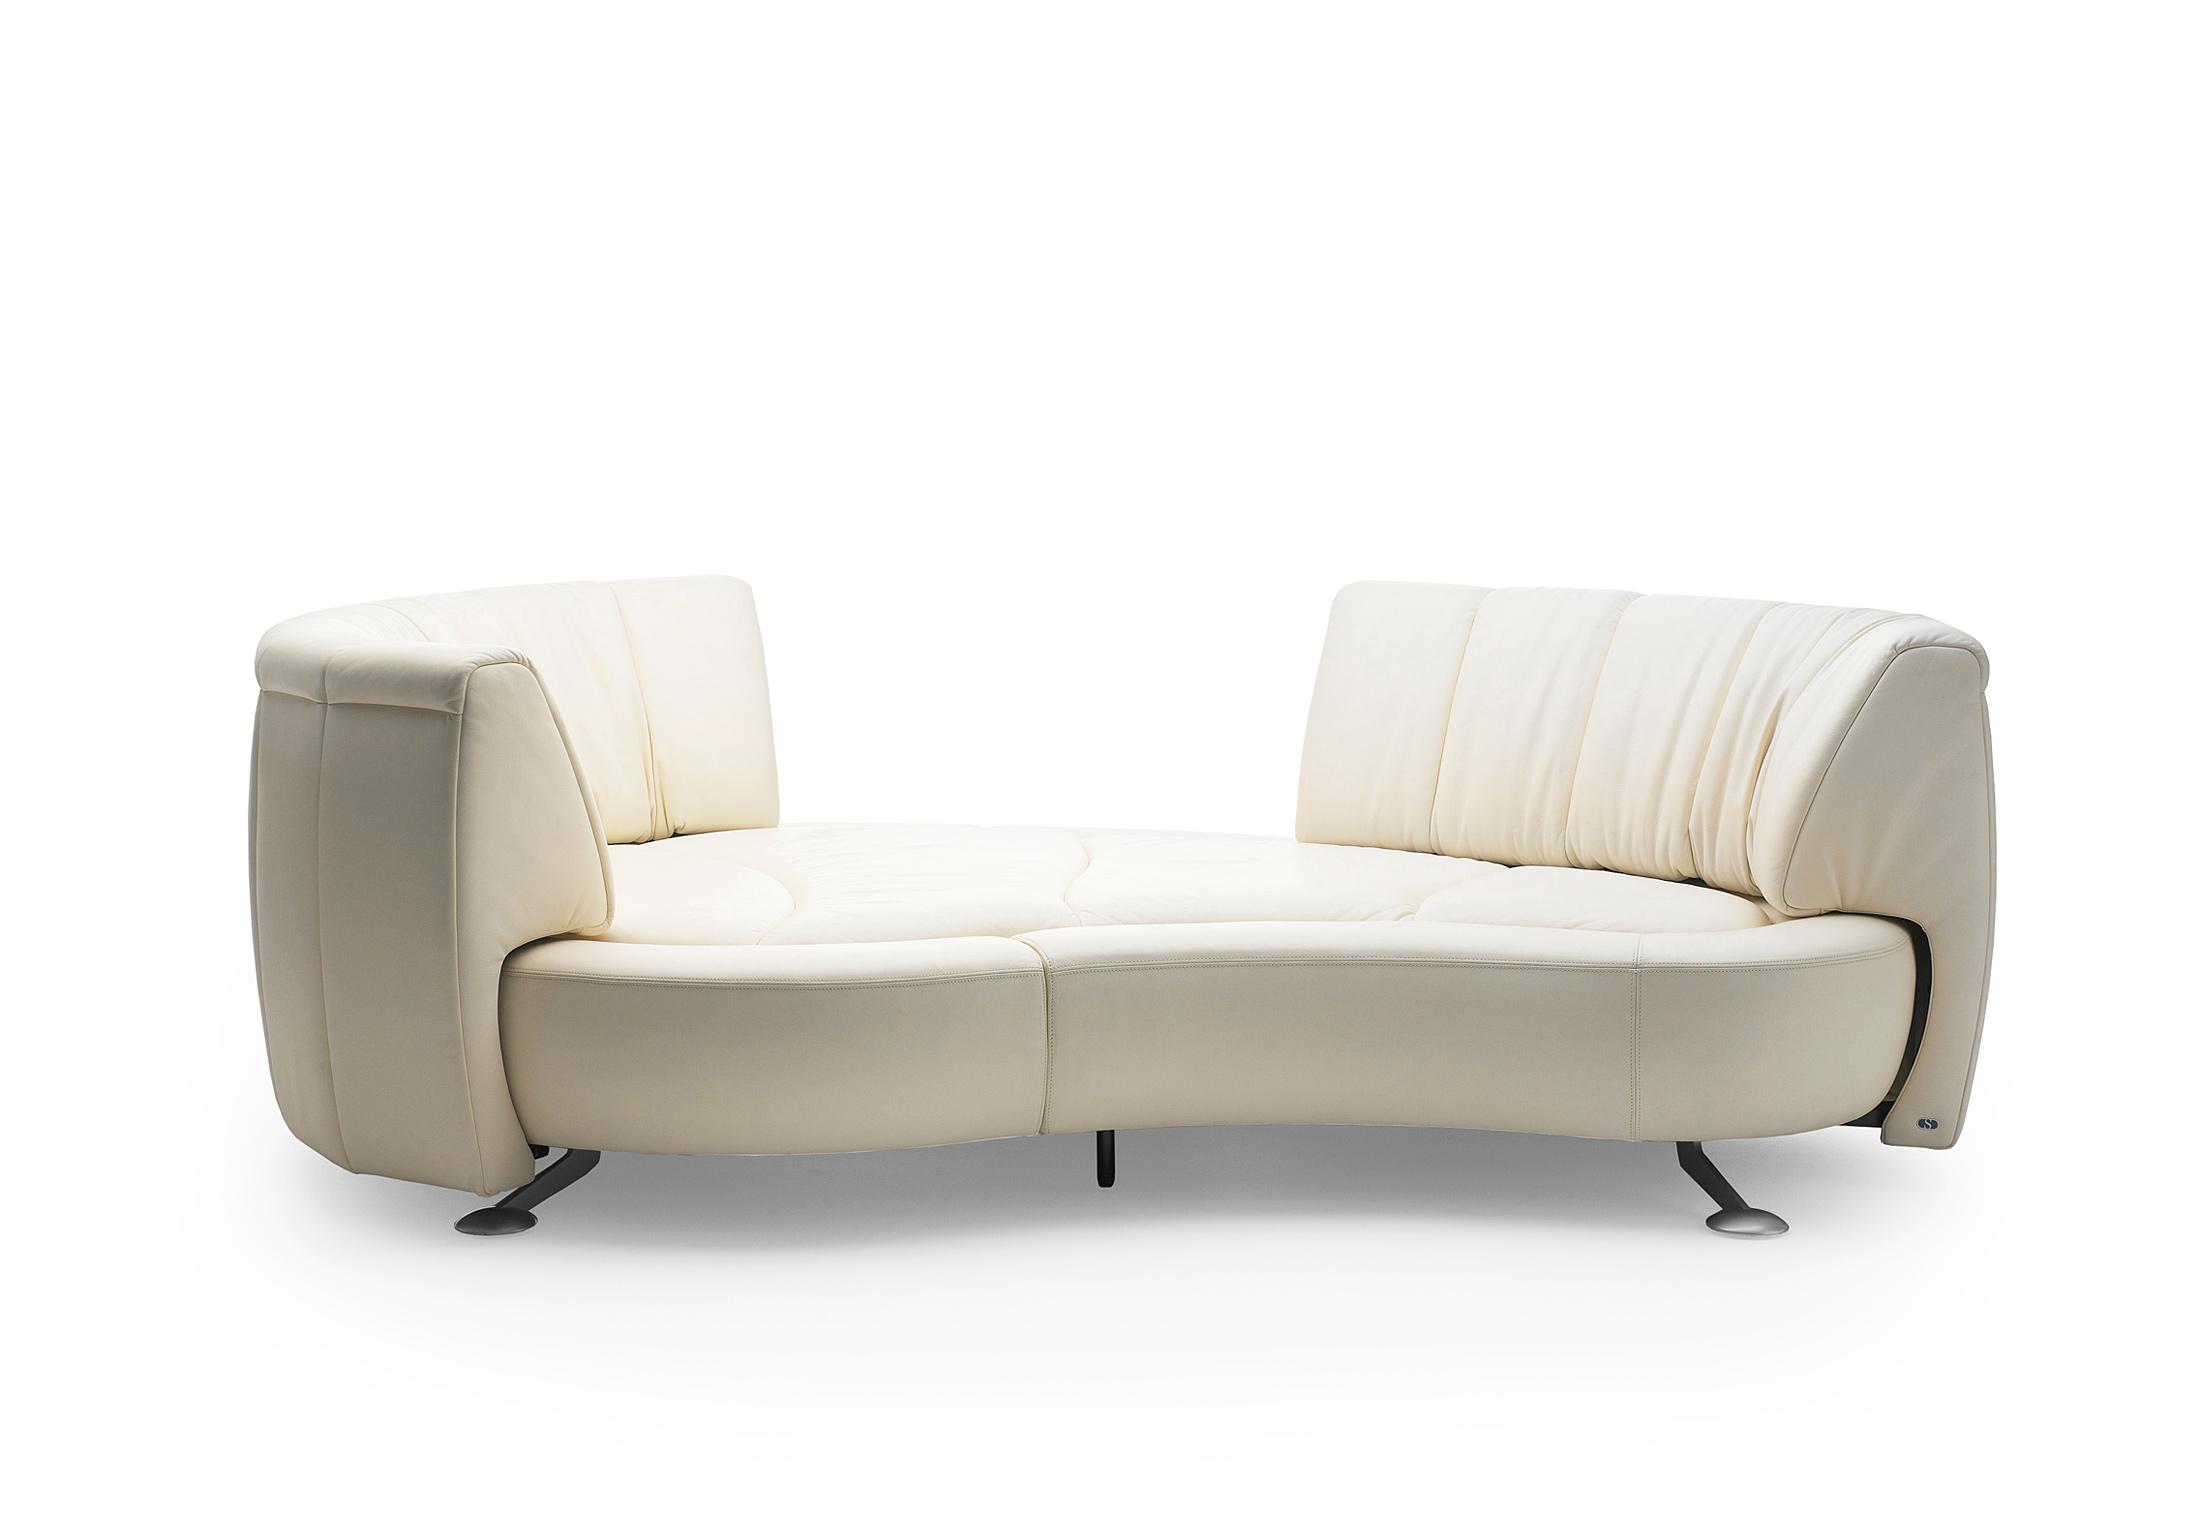 de sede sofa 164. Black Bedroom Furniture Sets. Home Design Ideas